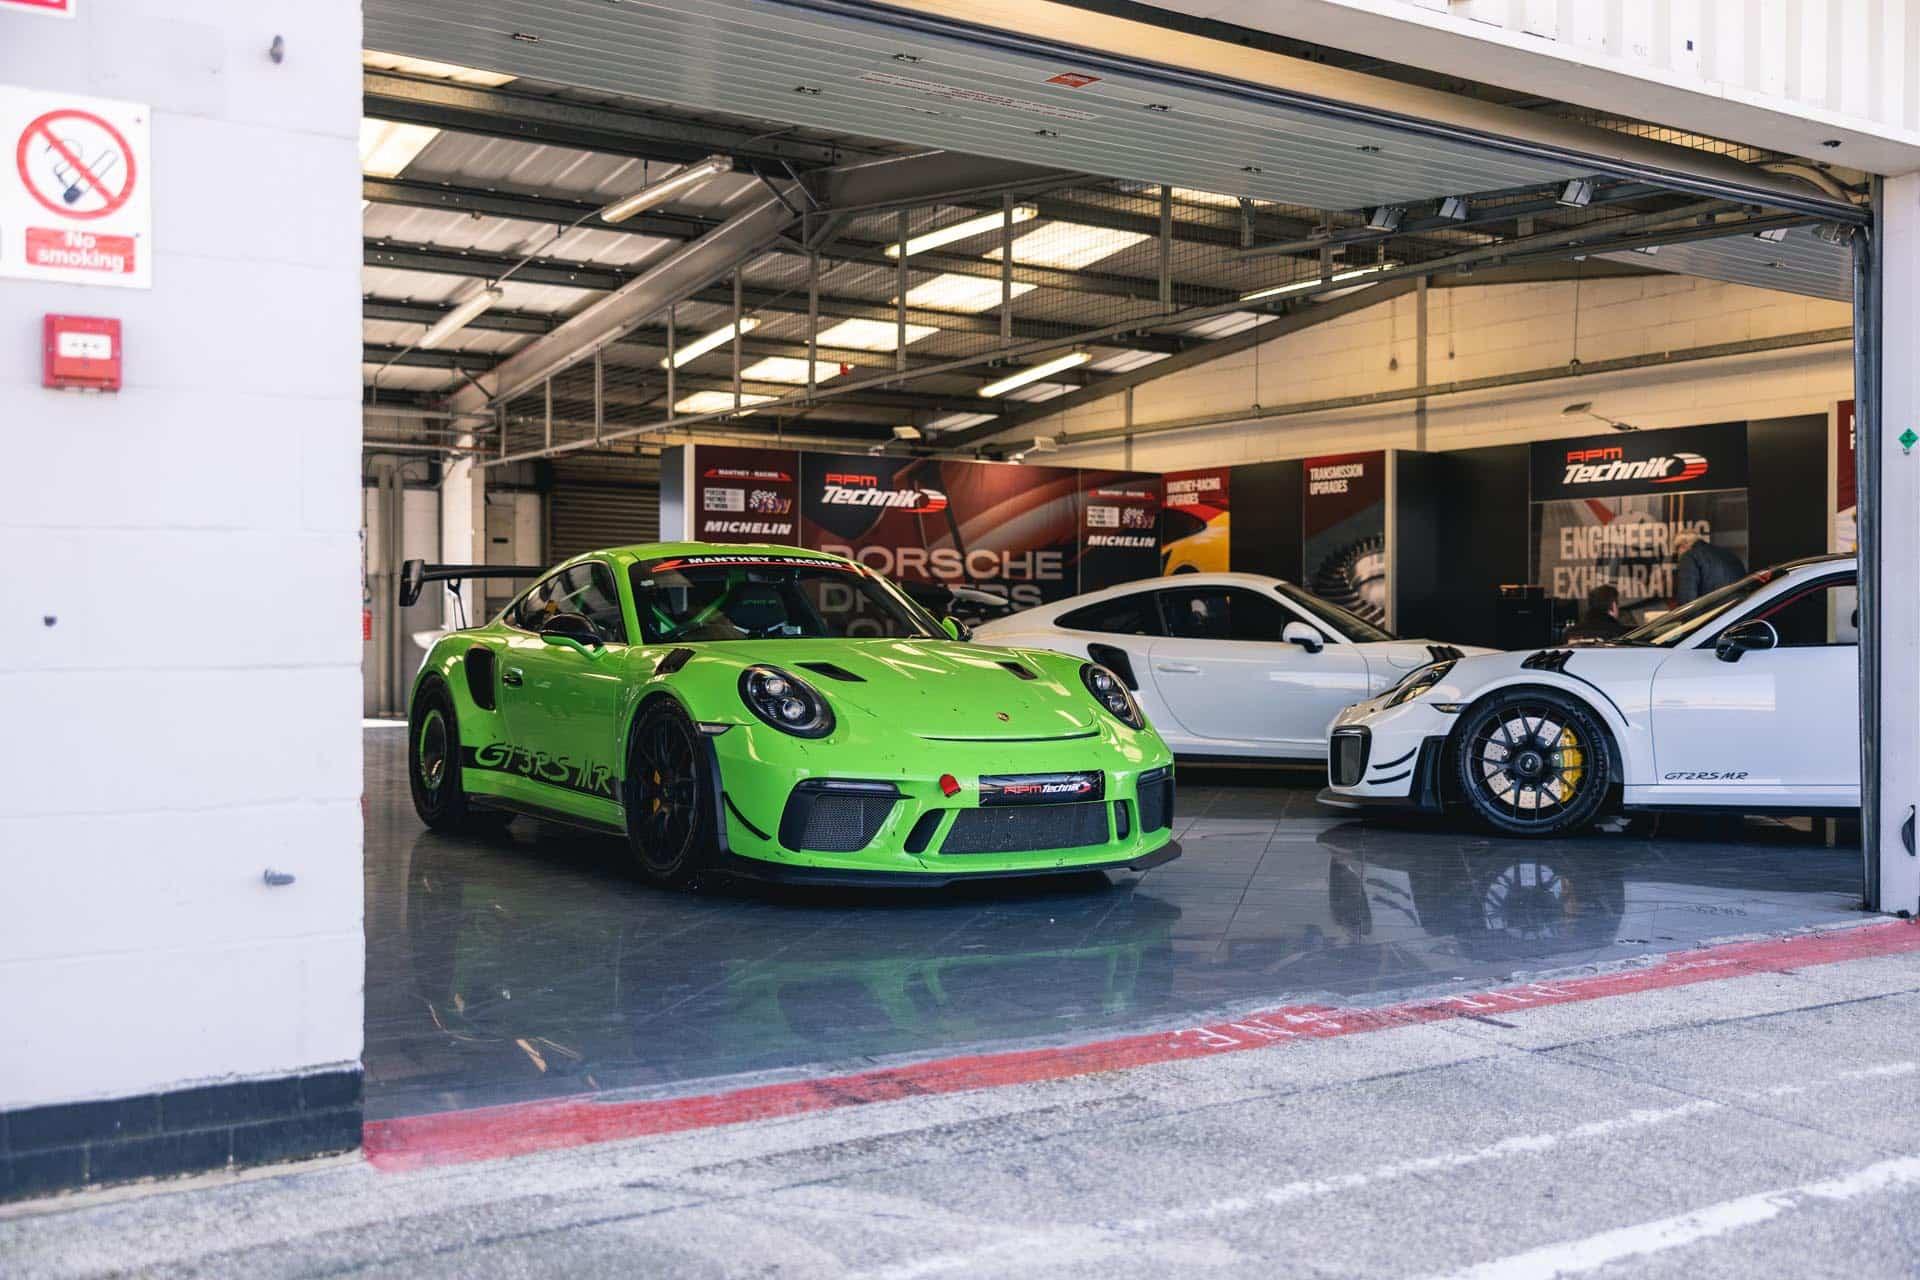 991.2-gt3rs-in-silverstone-garage